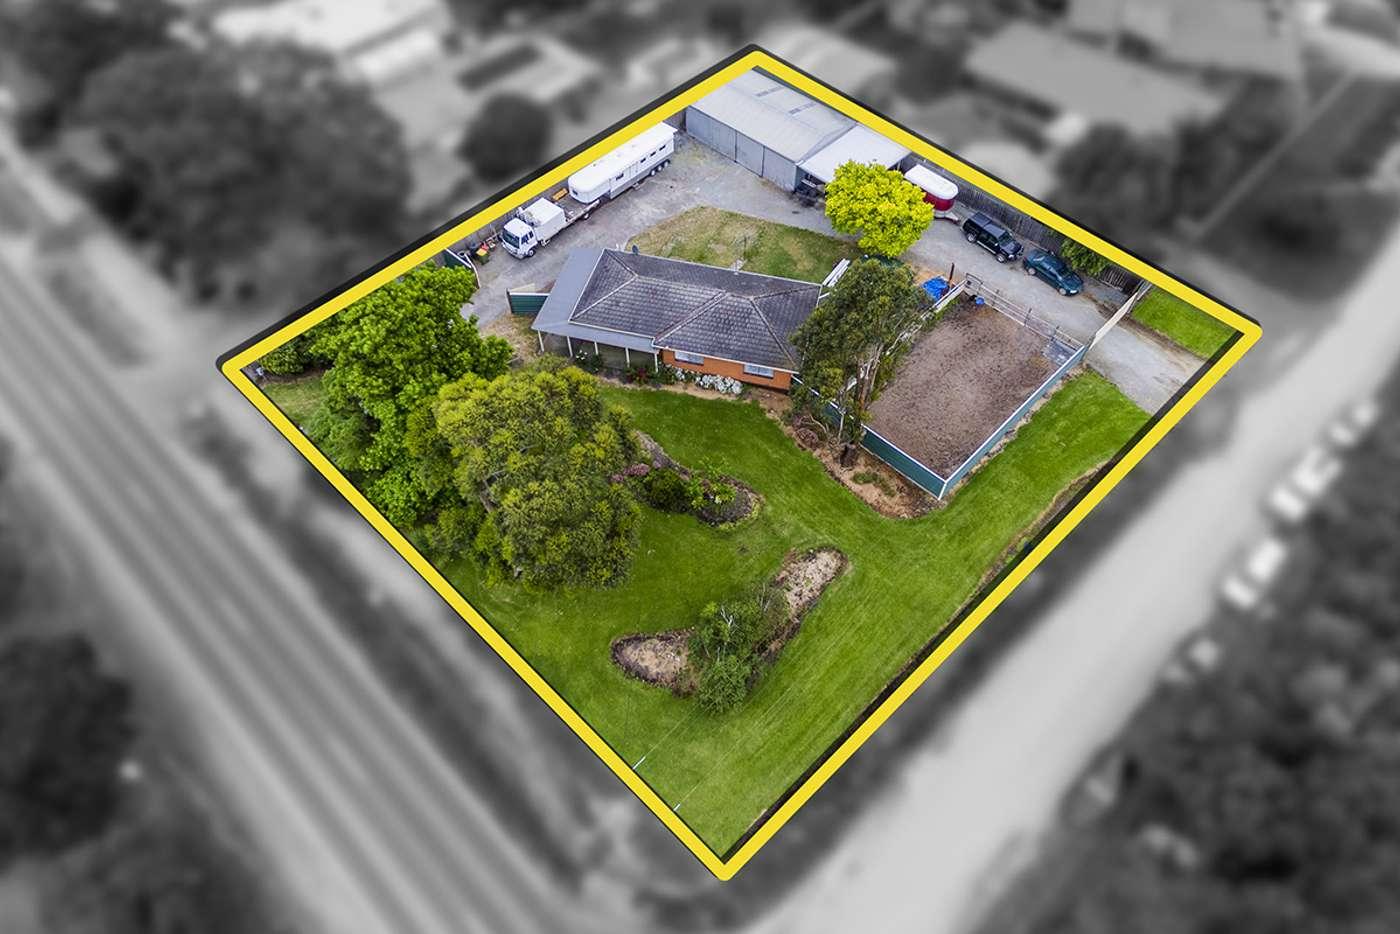 Main view of Homely house listing, 2380 Ballarto Road, Cardinia VIC 3978